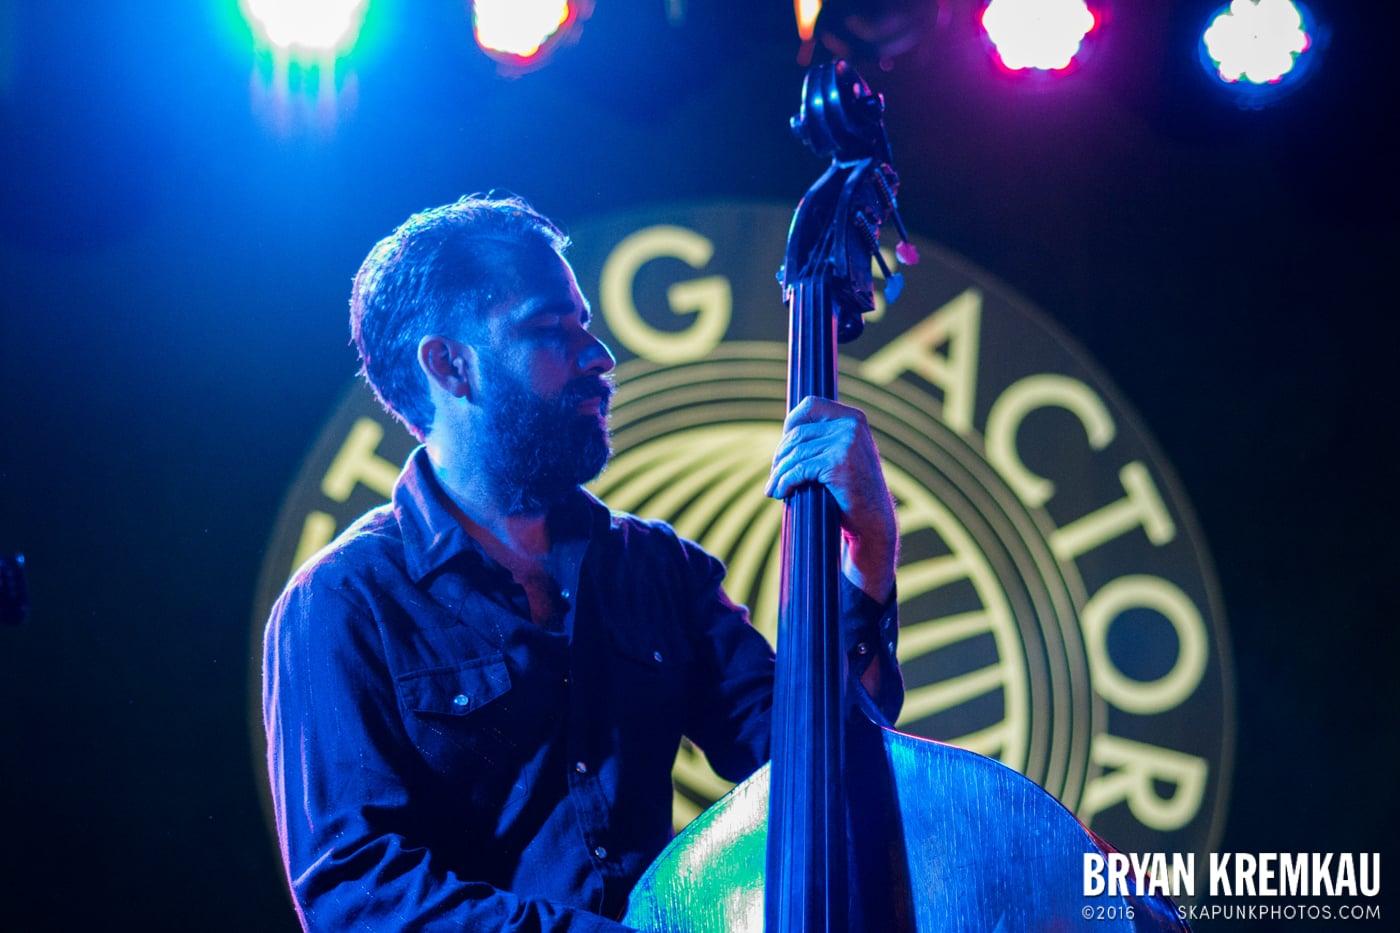 Danny Burns Band @ Knitting Factory, Brooklyn, NY - 9.10.14 (7)